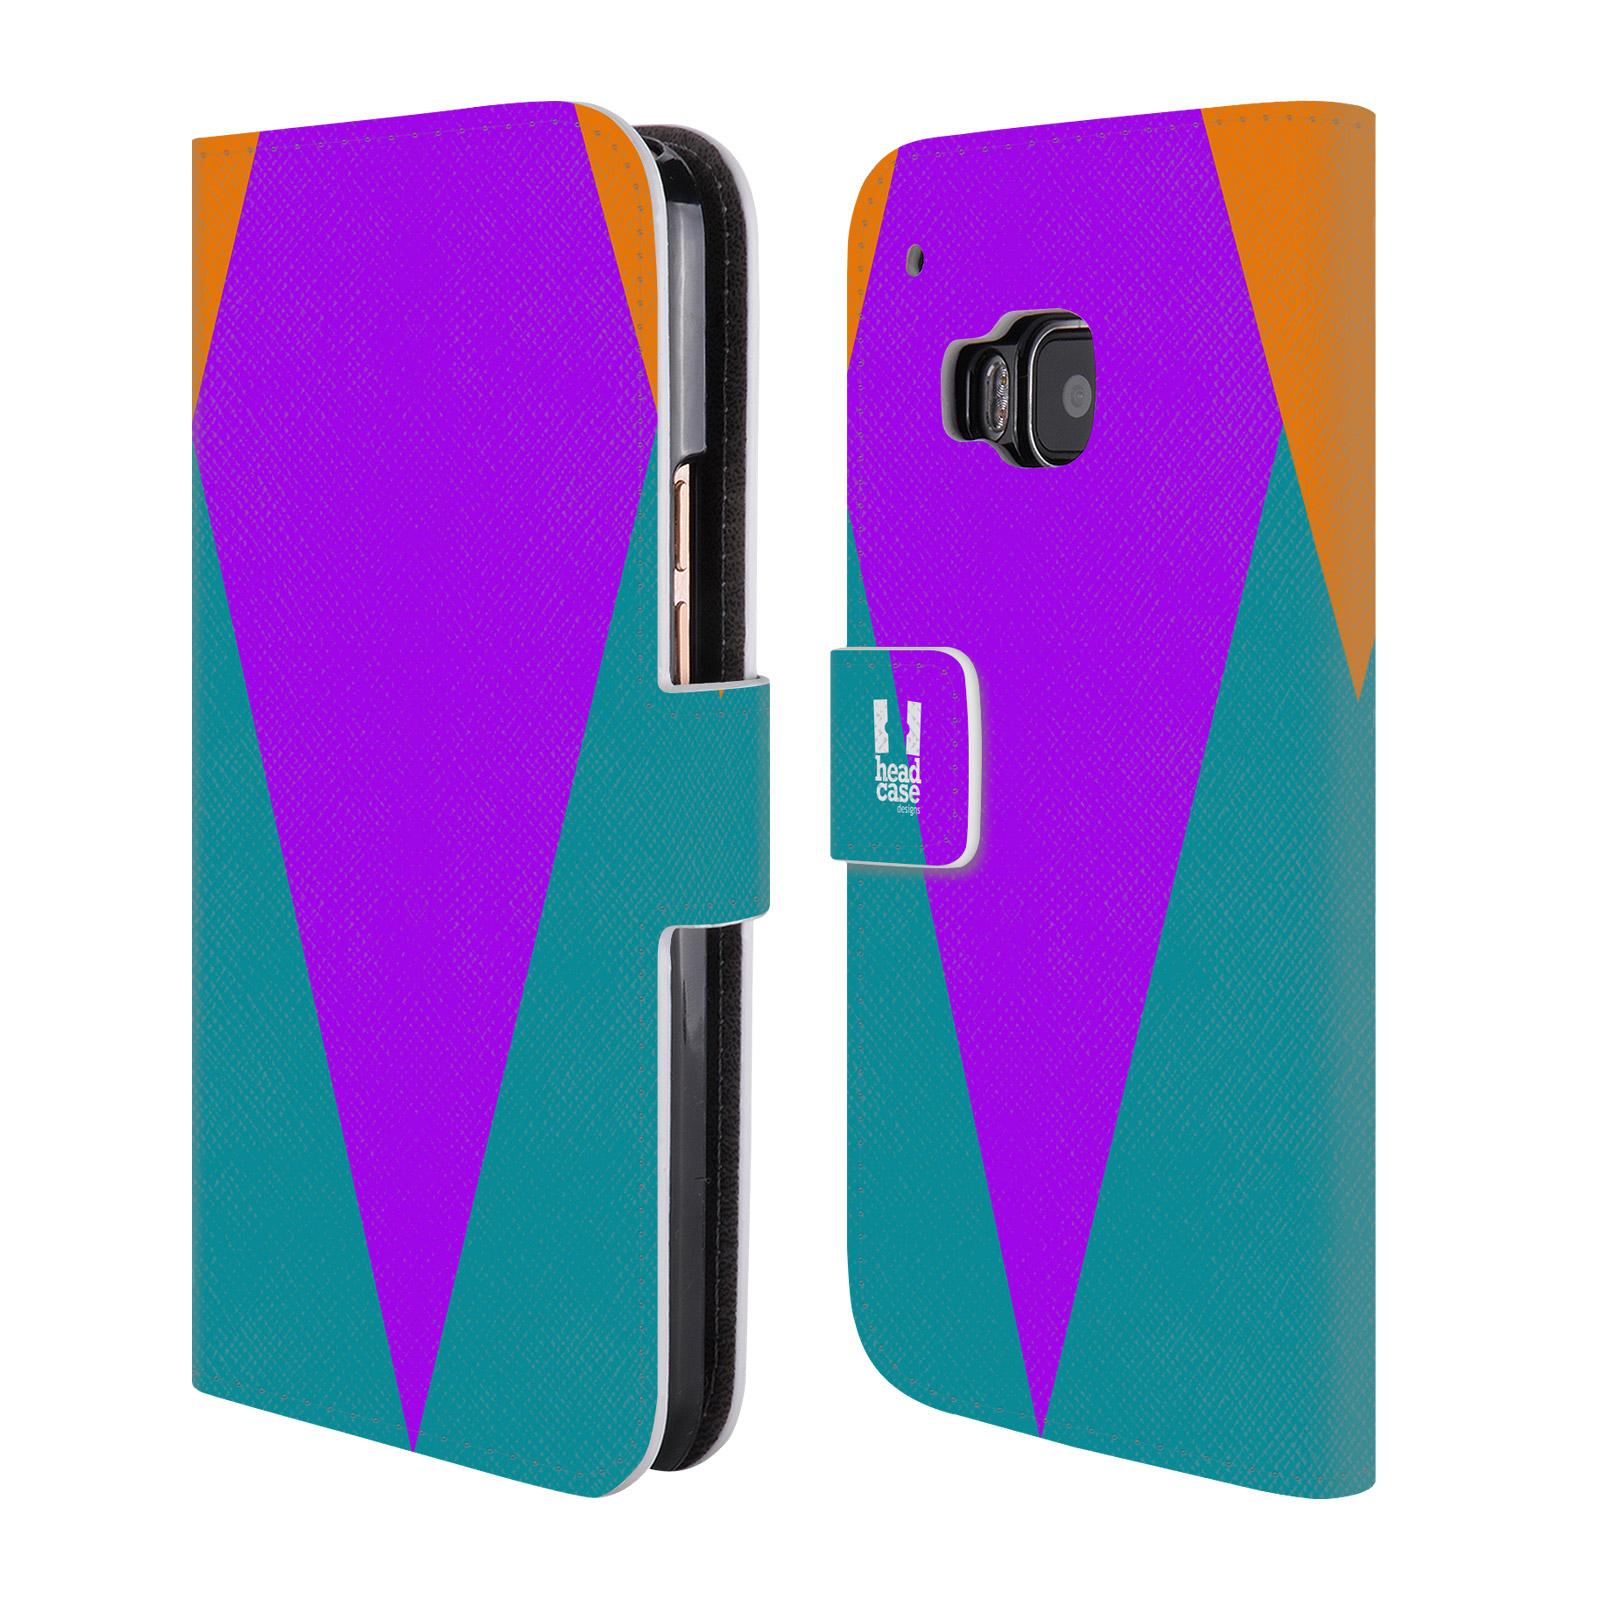 HEAD CASE Flipové pouzdro pro mobil HTC ONE M9 barevné tvary šipka fialová